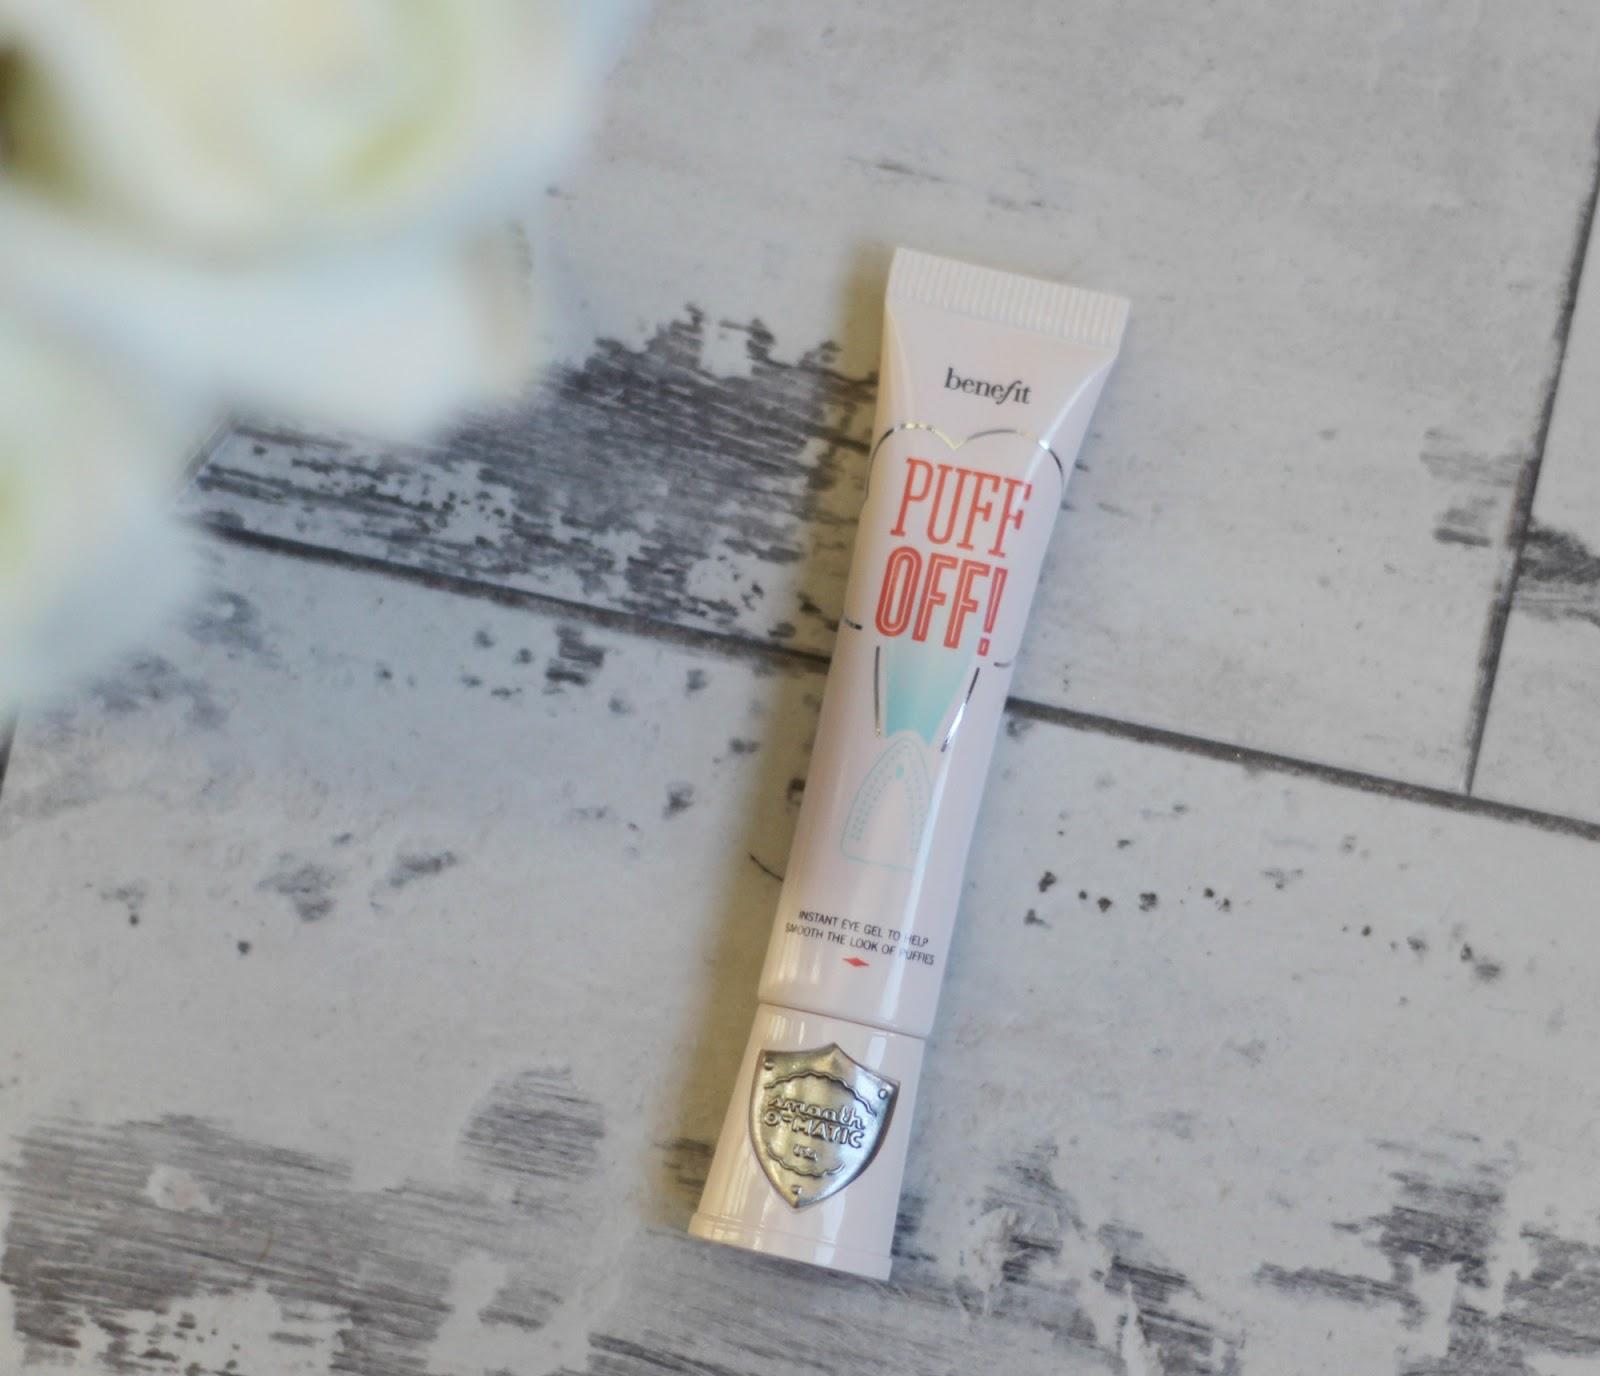 benefit, benefit puff off, benefit puff off eye gel, through chelsea's eyes, benefit skincare